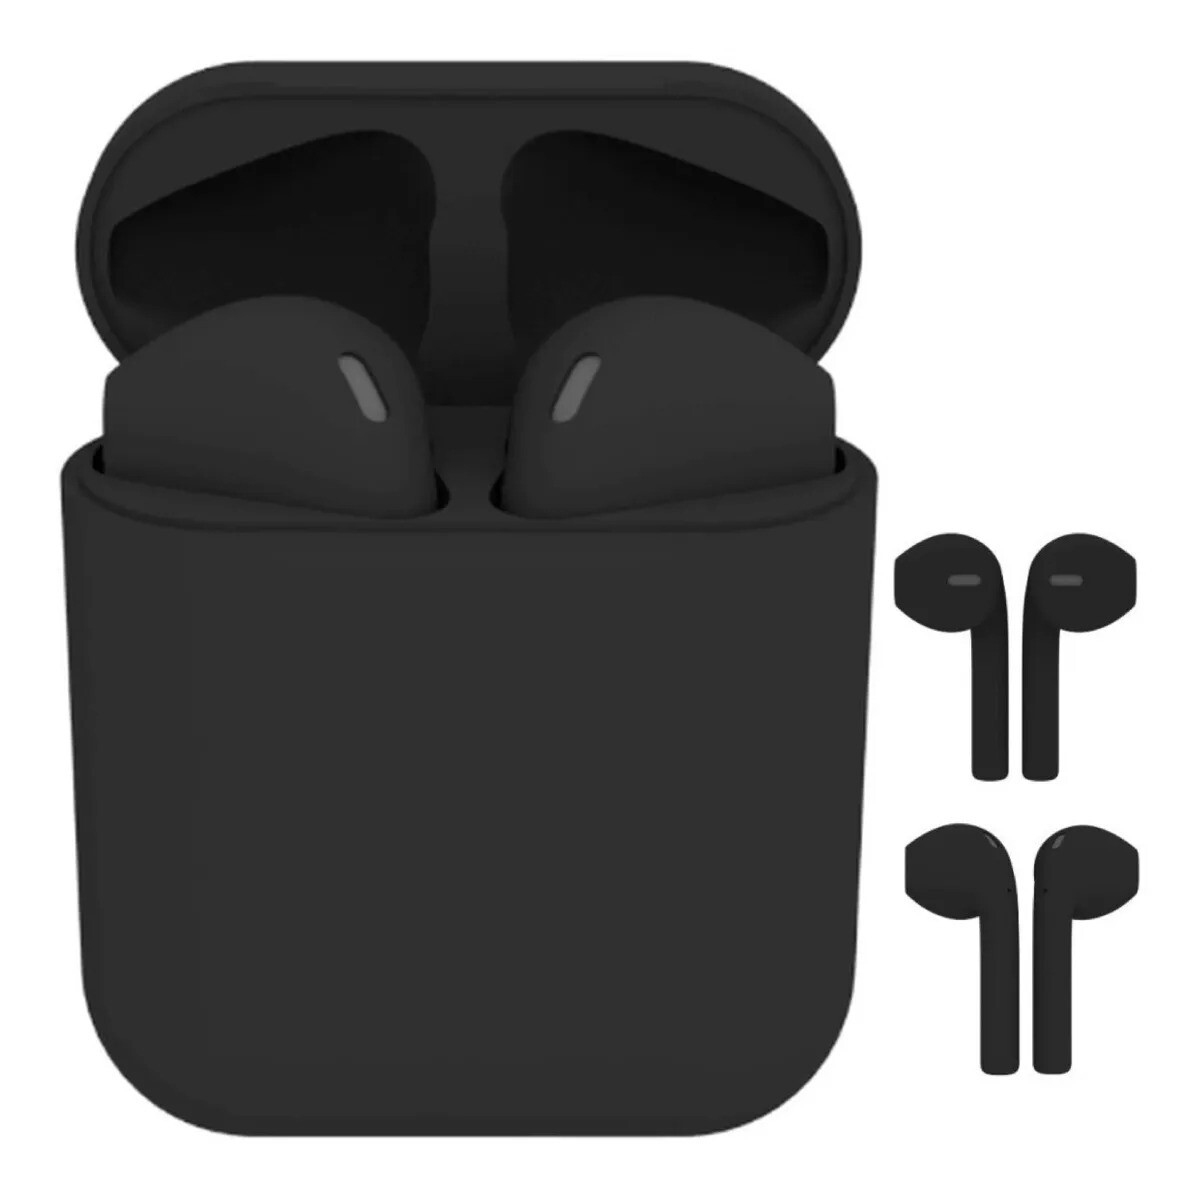 INPOD 12 - Audífonos inalámbricos